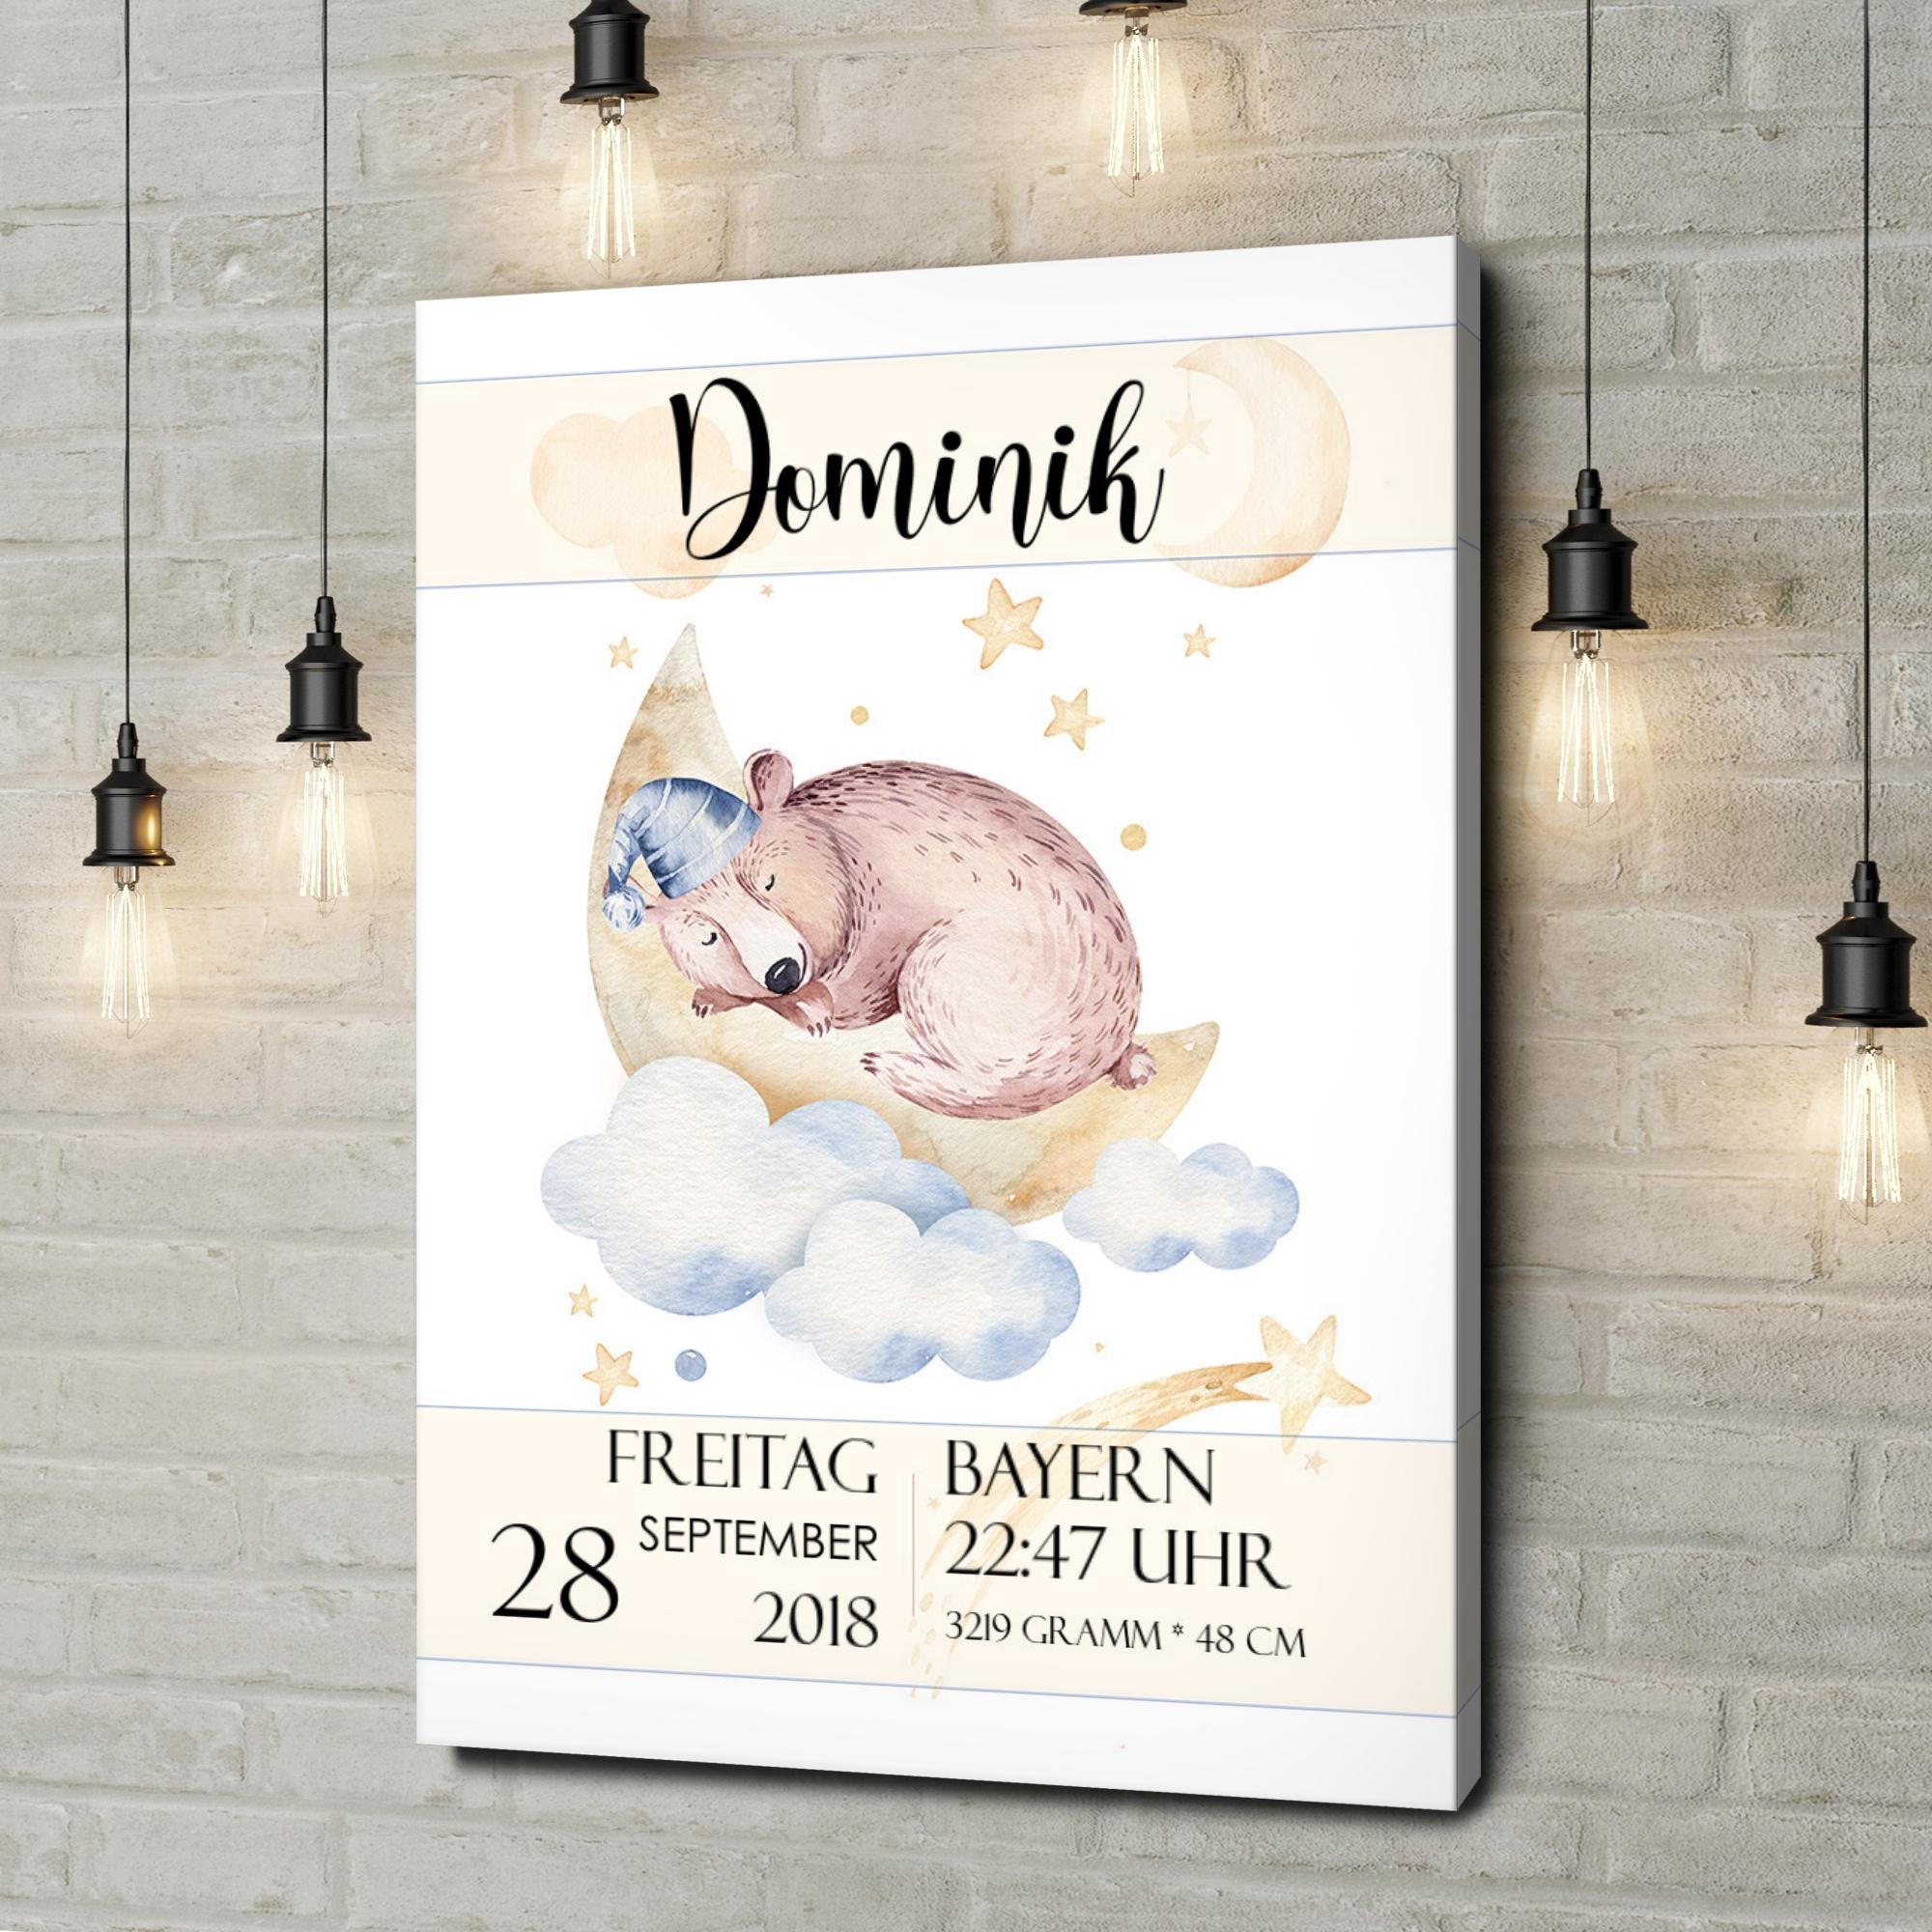 Leinwandbild personalisiert Leinwand zur Geburt Bär träumt